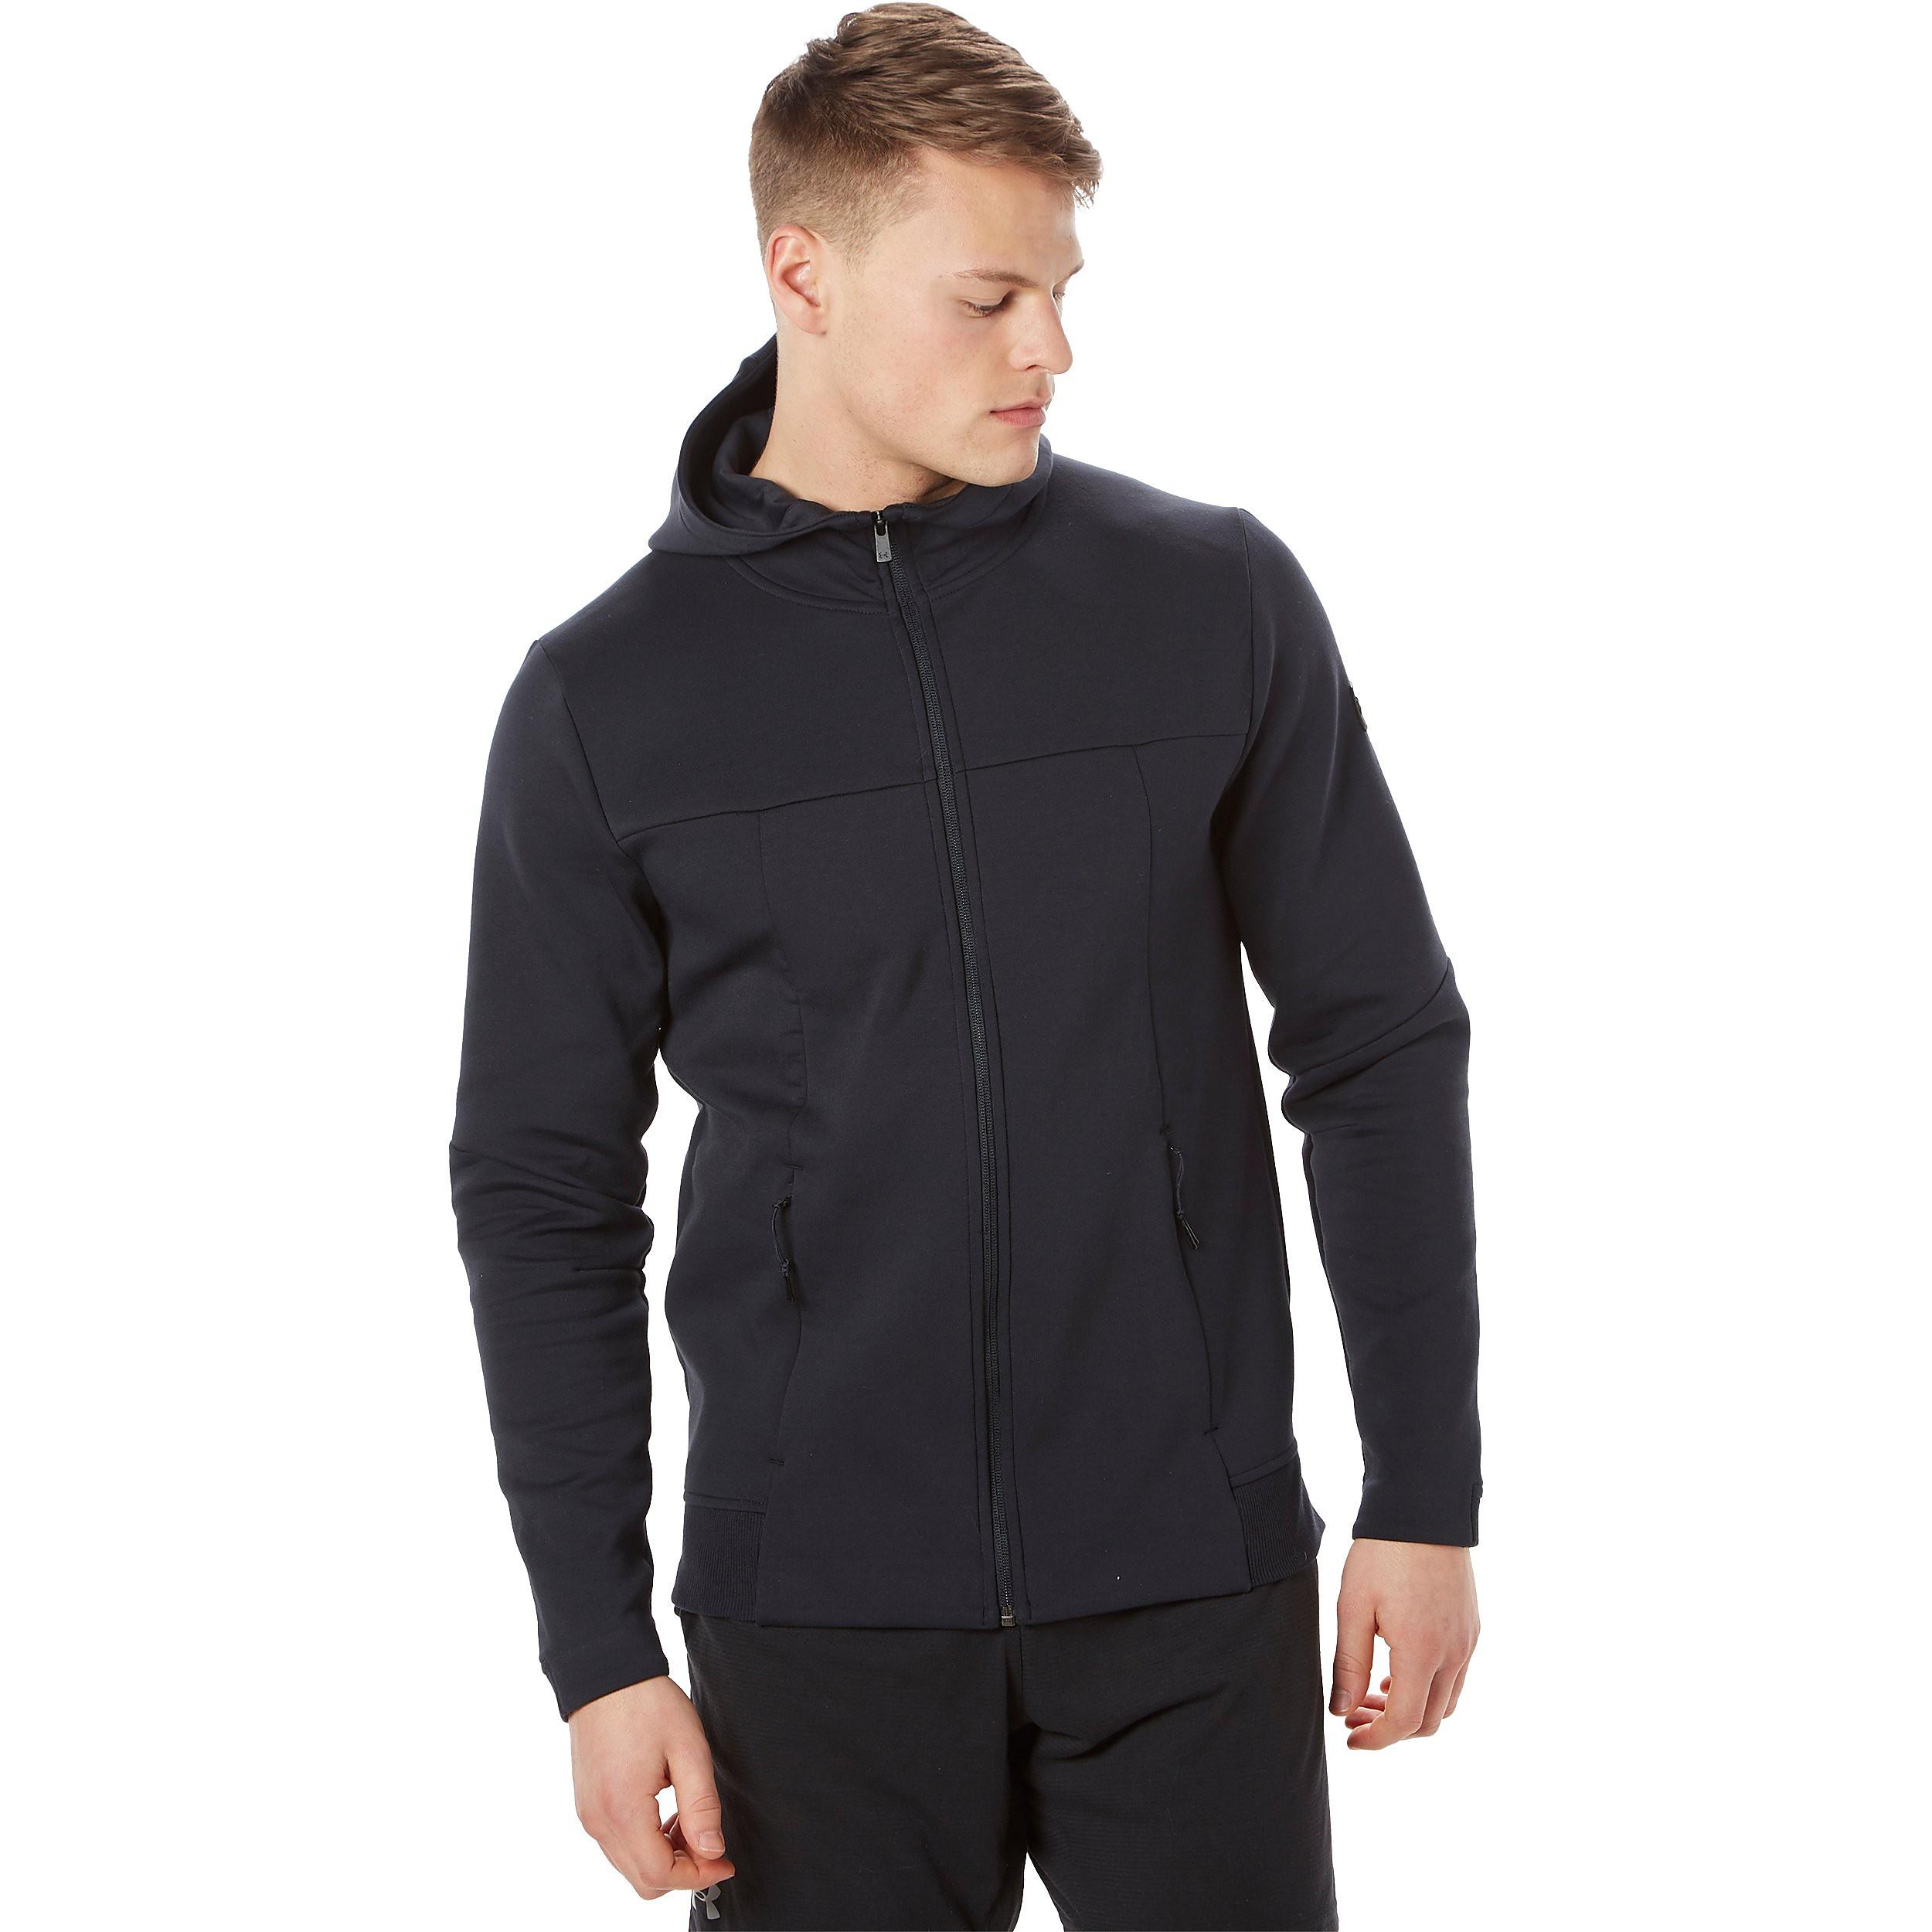 Under Armour Sportstyle Elite Utility Full Zip Men's Training Jacket